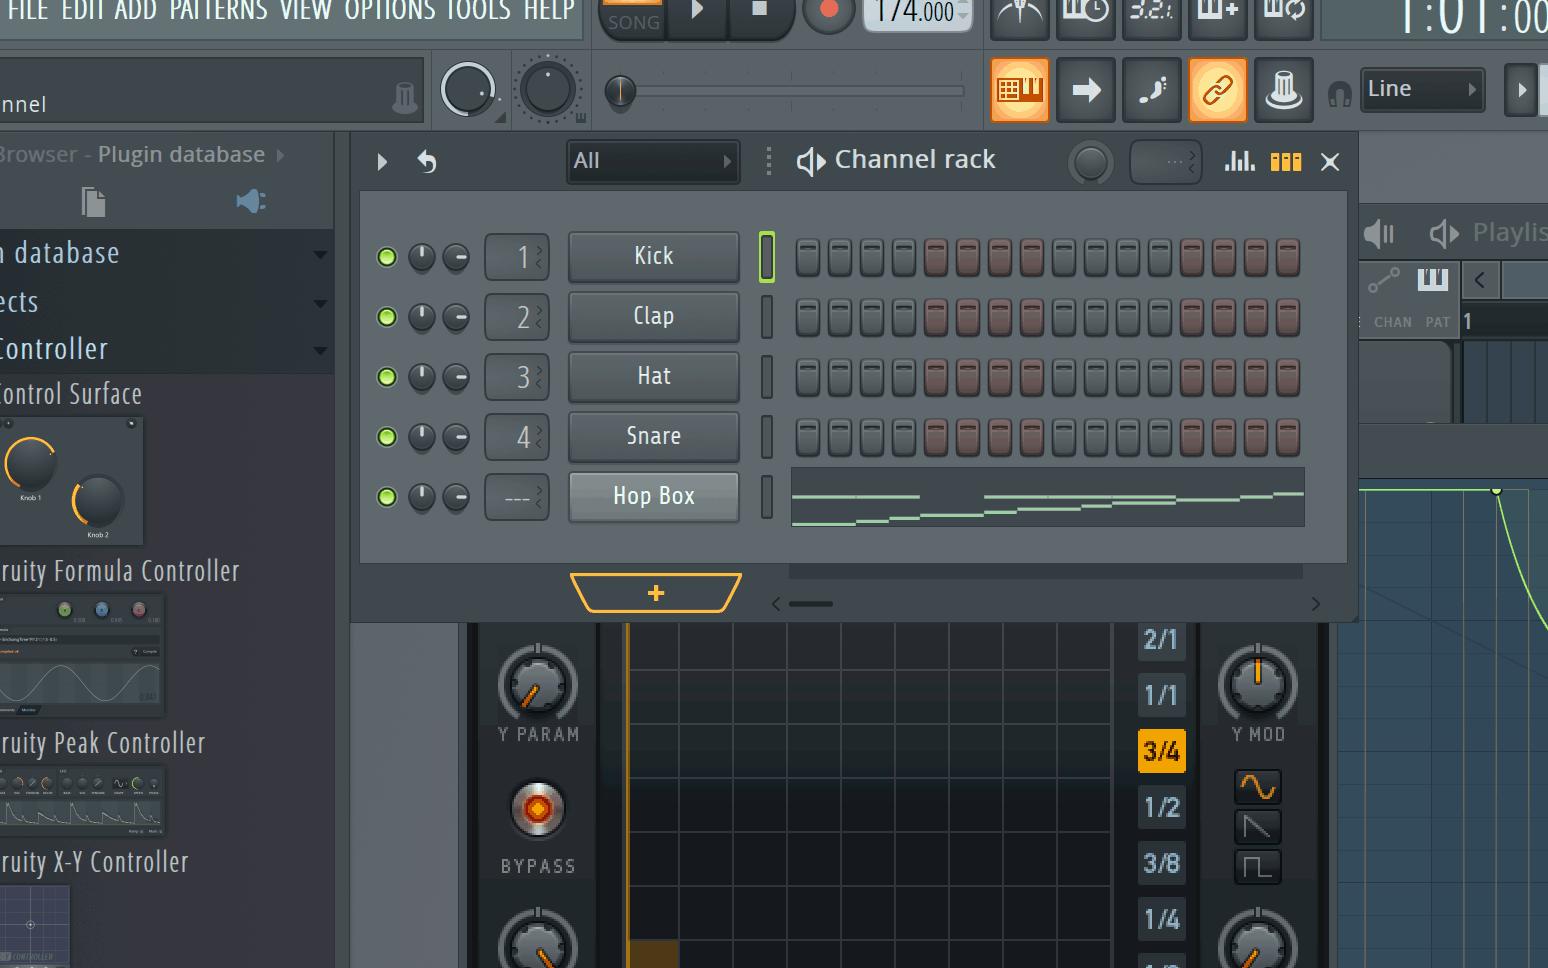 FL Studio Add Plugins